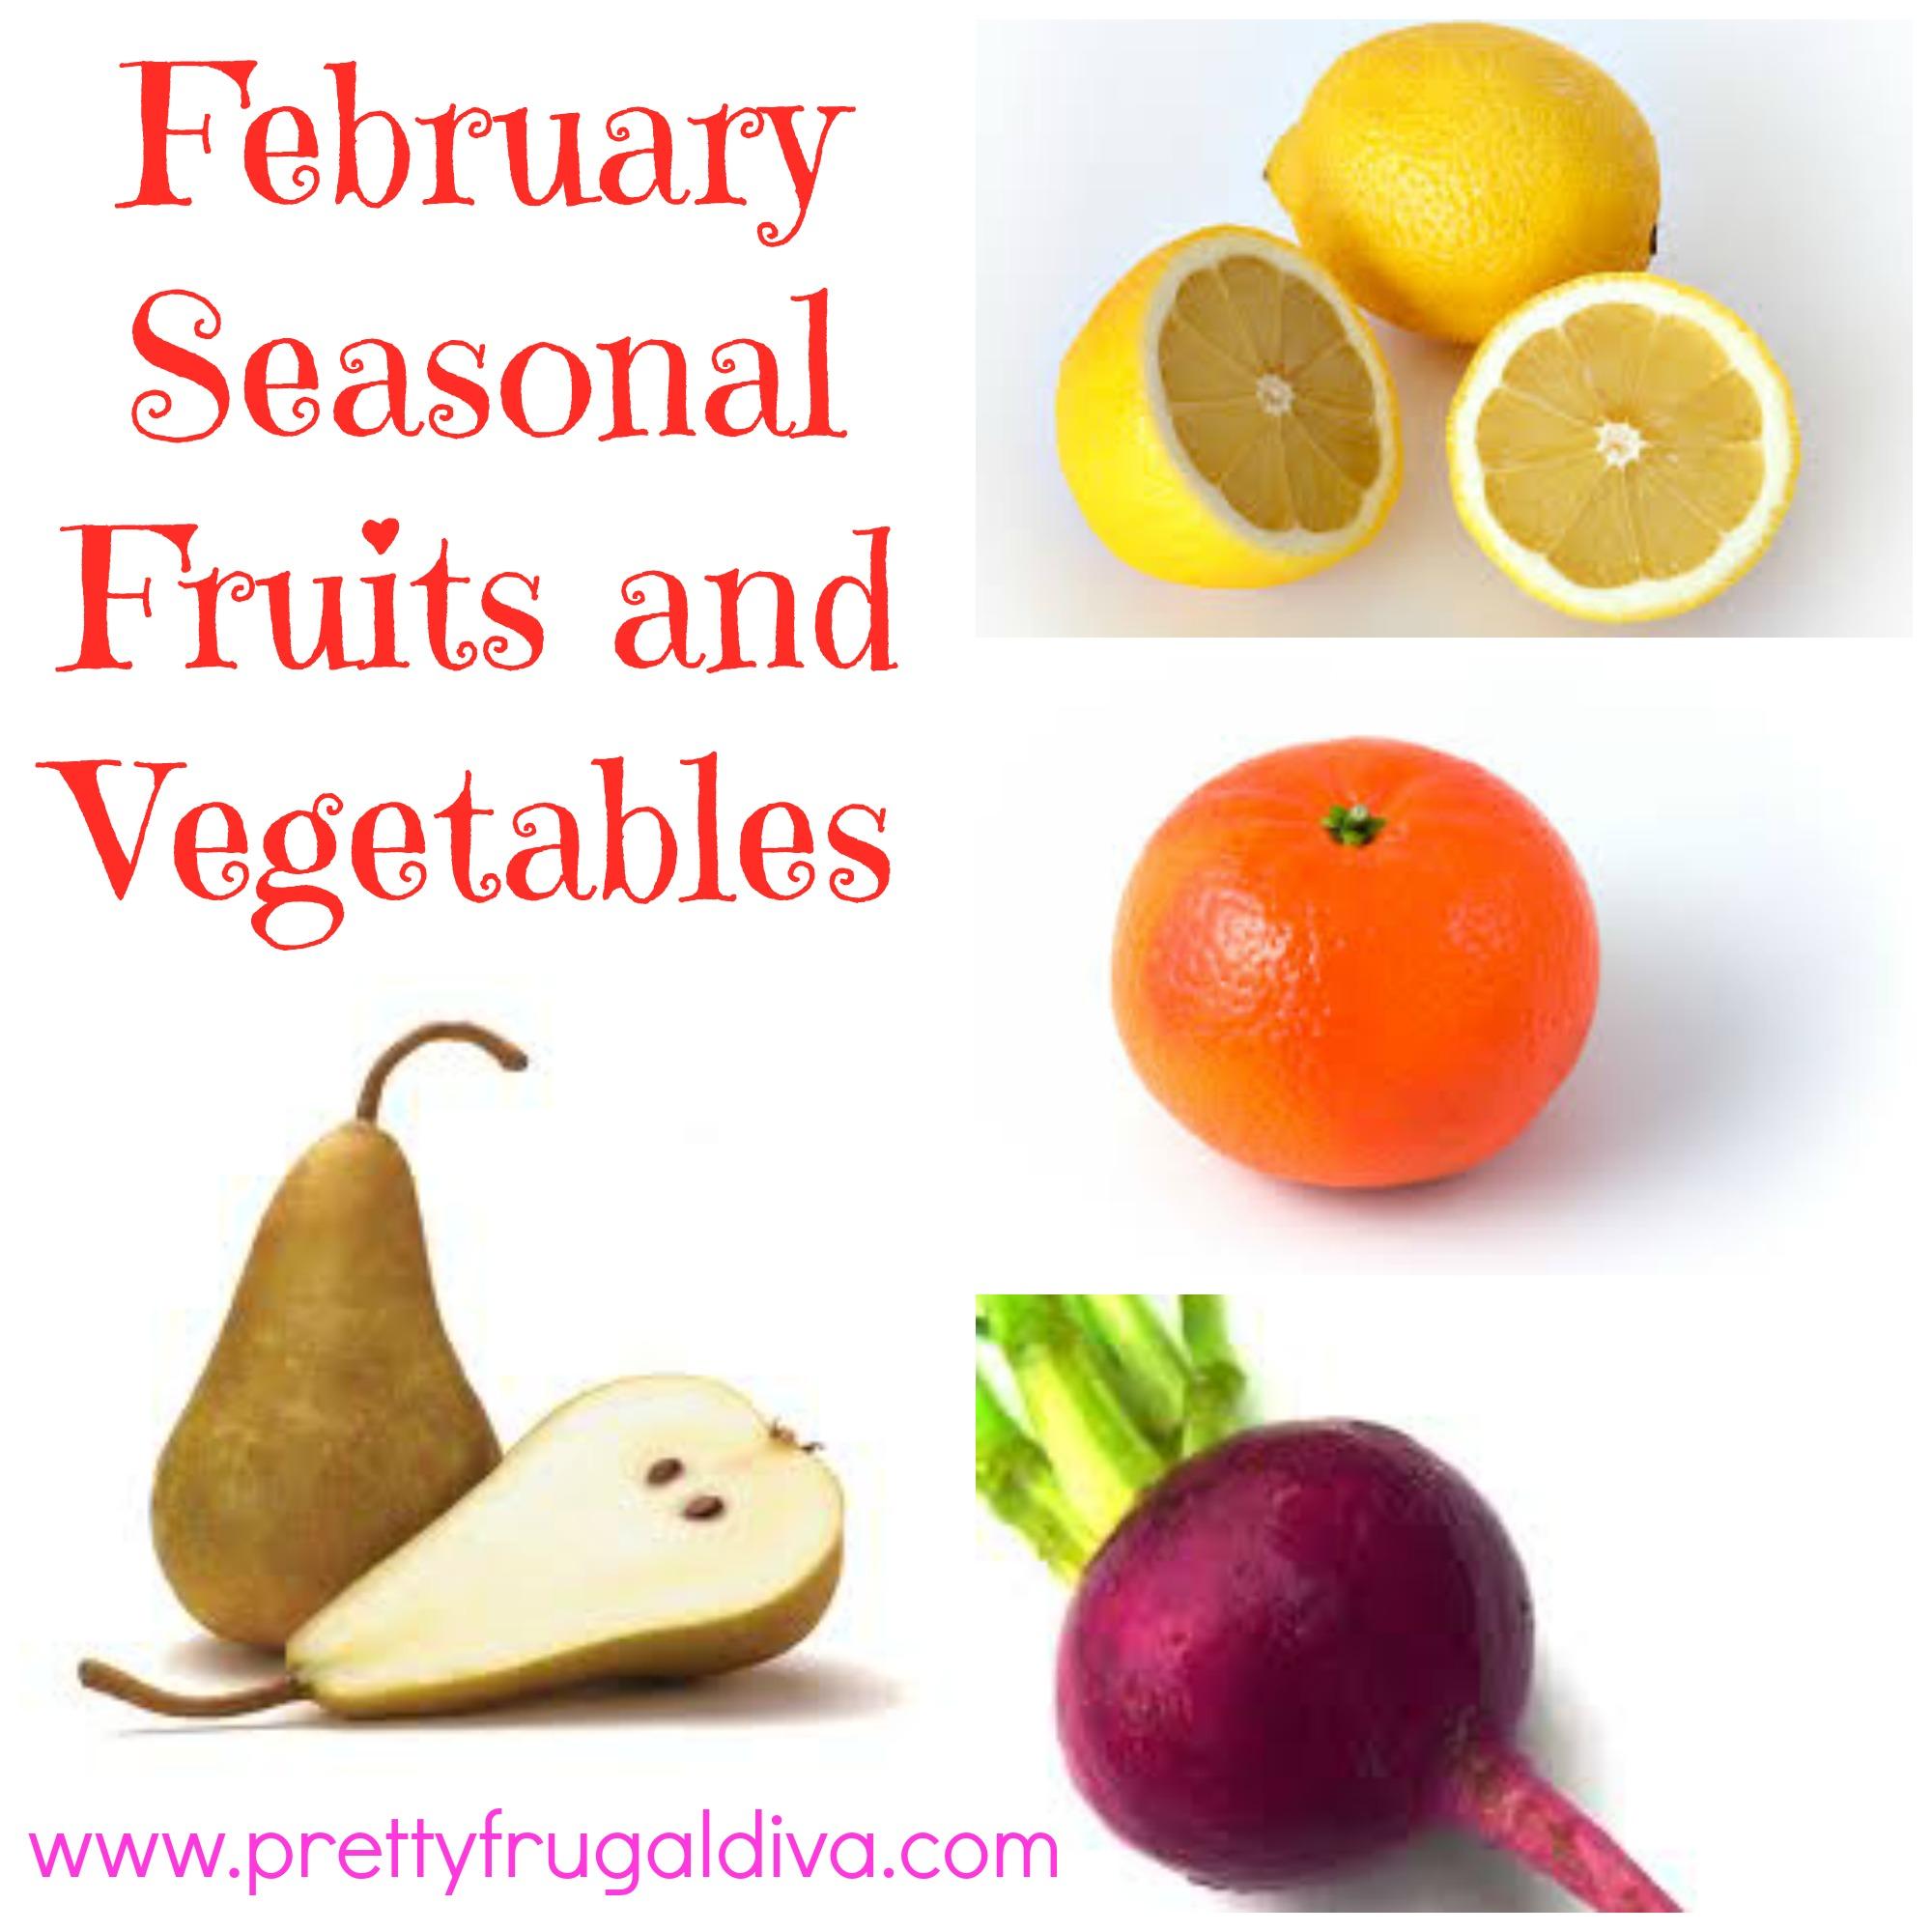 February Seasonal Fruits and Vegetables